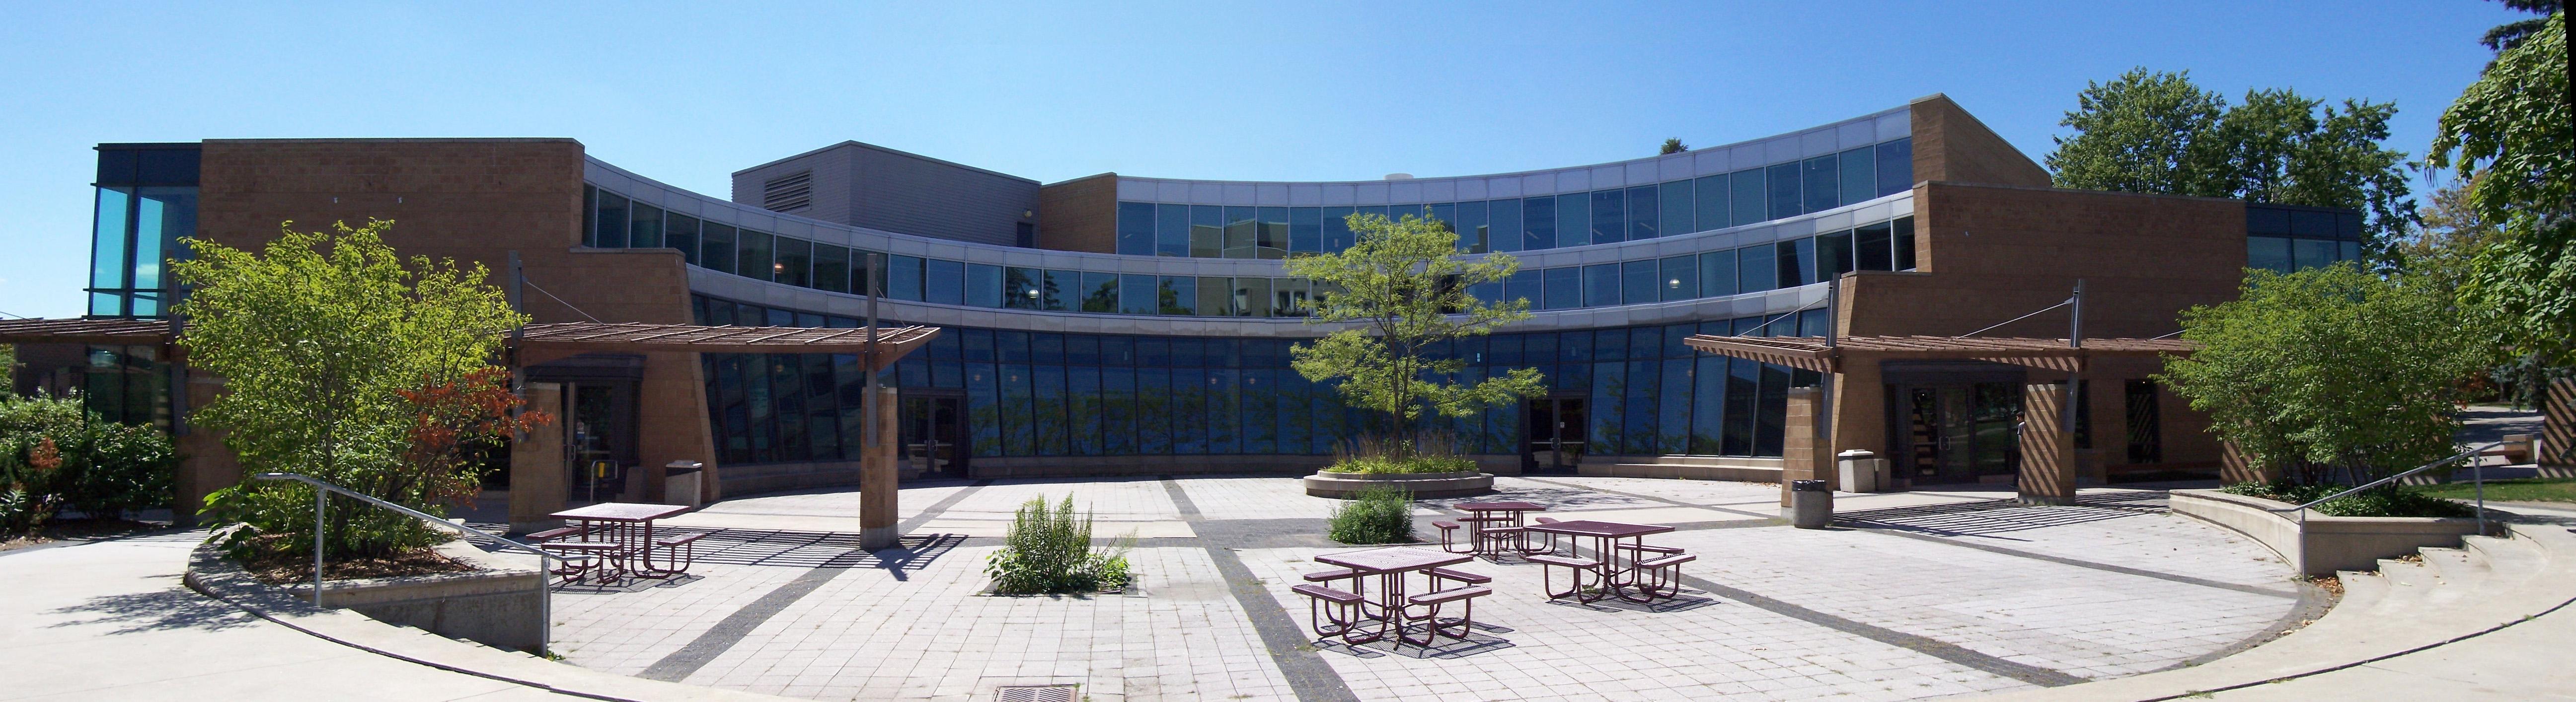 Du học Canada tại Đại học Waterloo